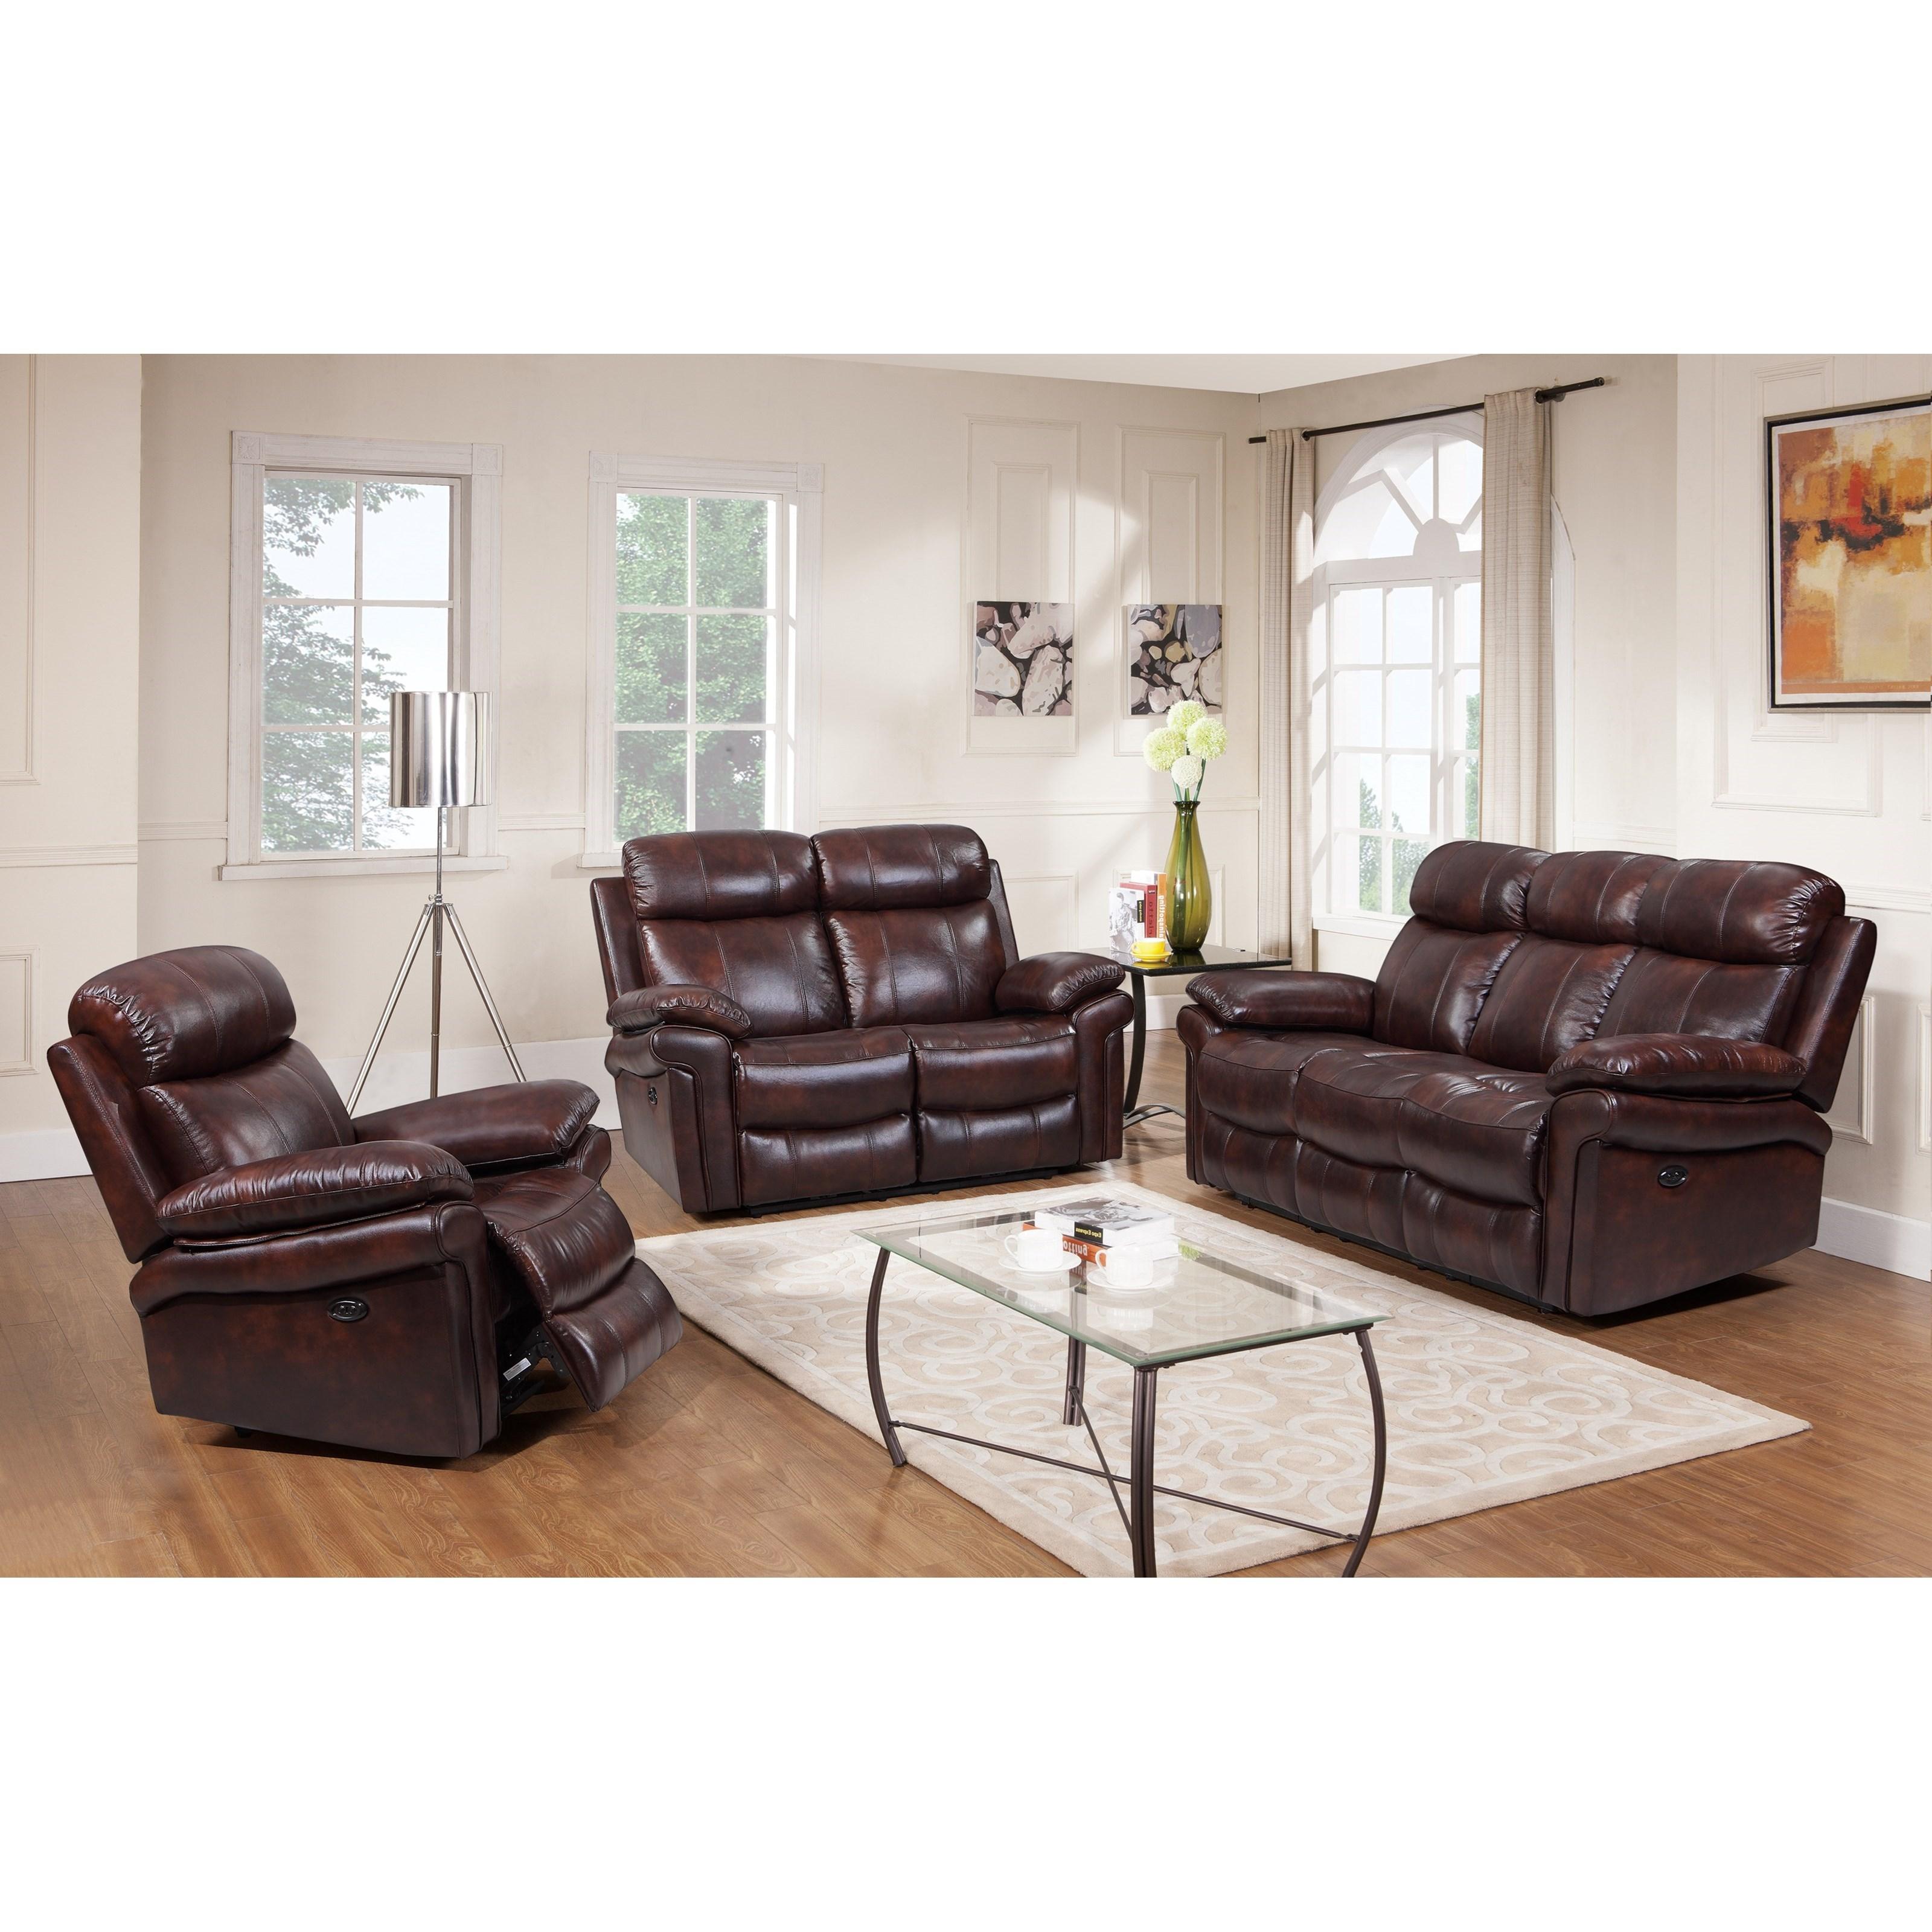 Shae - Joplin Reclining Living Room Group by Leather Italia USA at Johnny Janosik